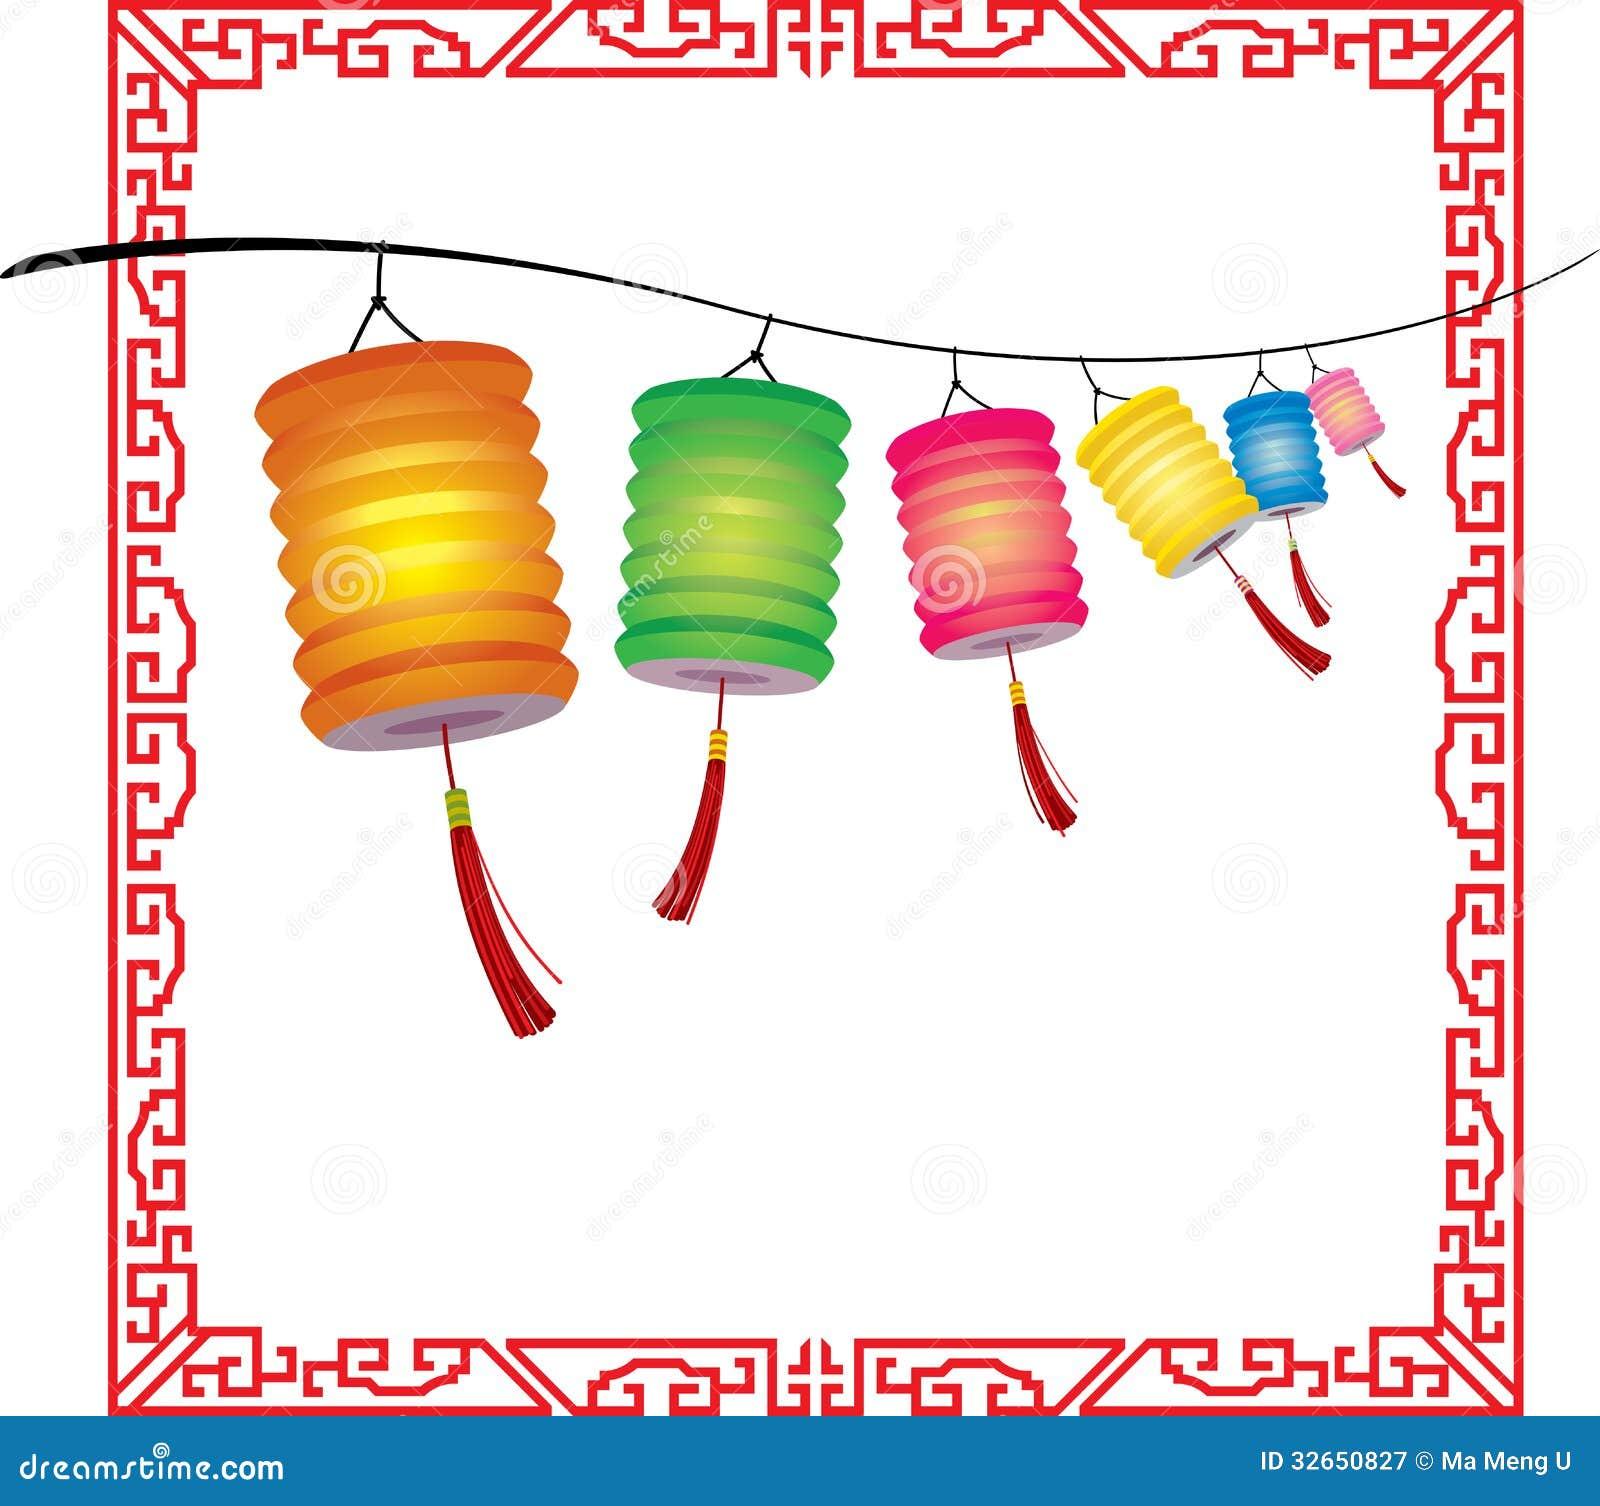 String Of Bright Hanging Chinese Lanterns Decorati Royalty Free Stock ...